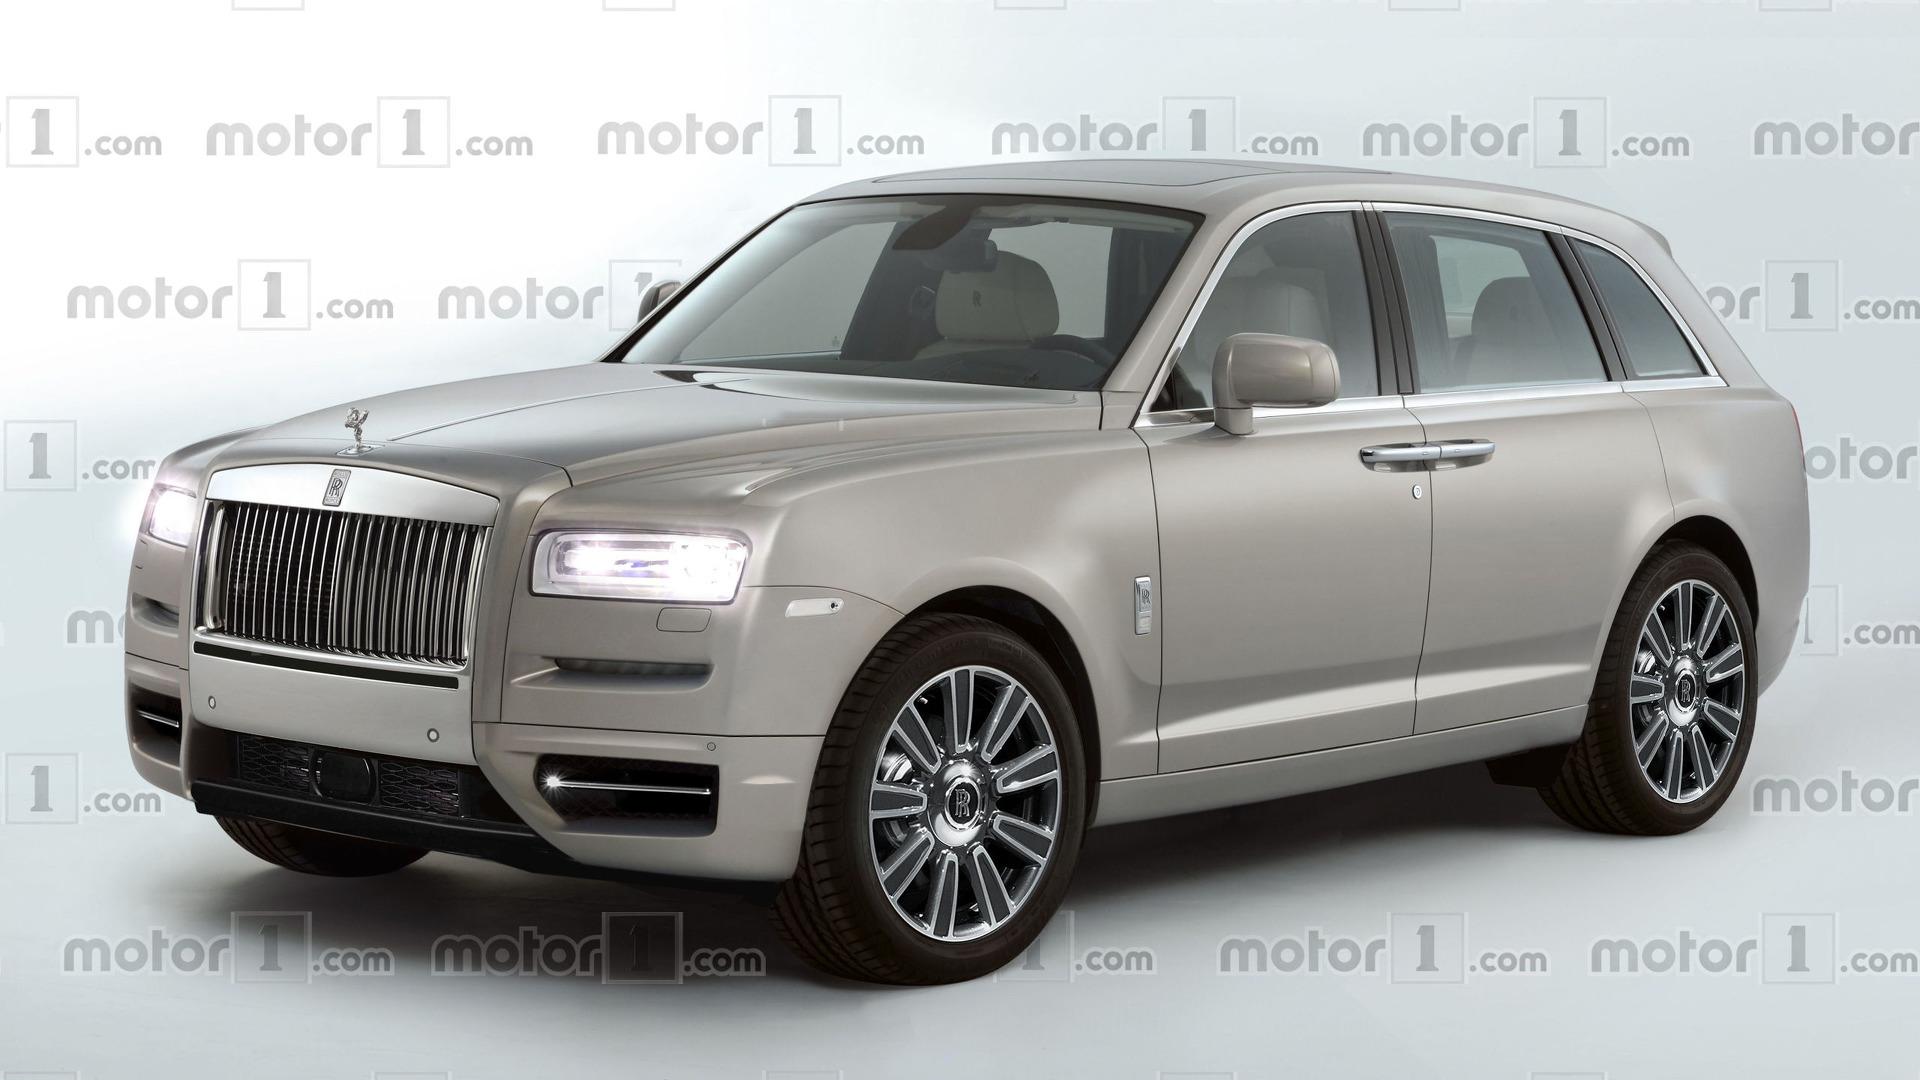 Cullinan Rolls Royce Interior >> Rolls-Royce Cullinan render wants to steer you away from a Bentayga